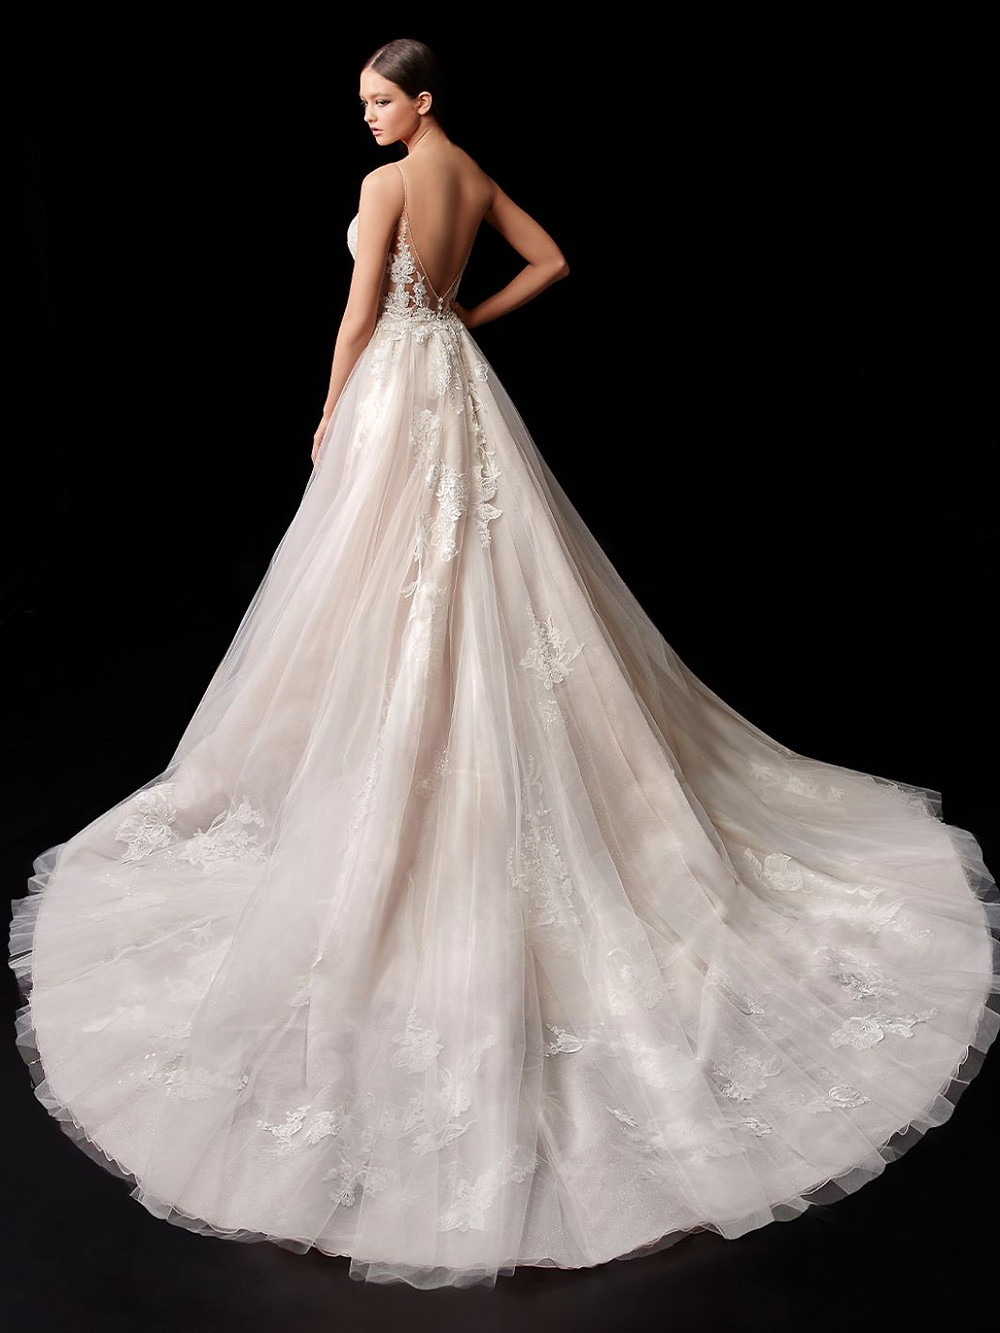 Enzoani Wedding Dress Paige with overskirt